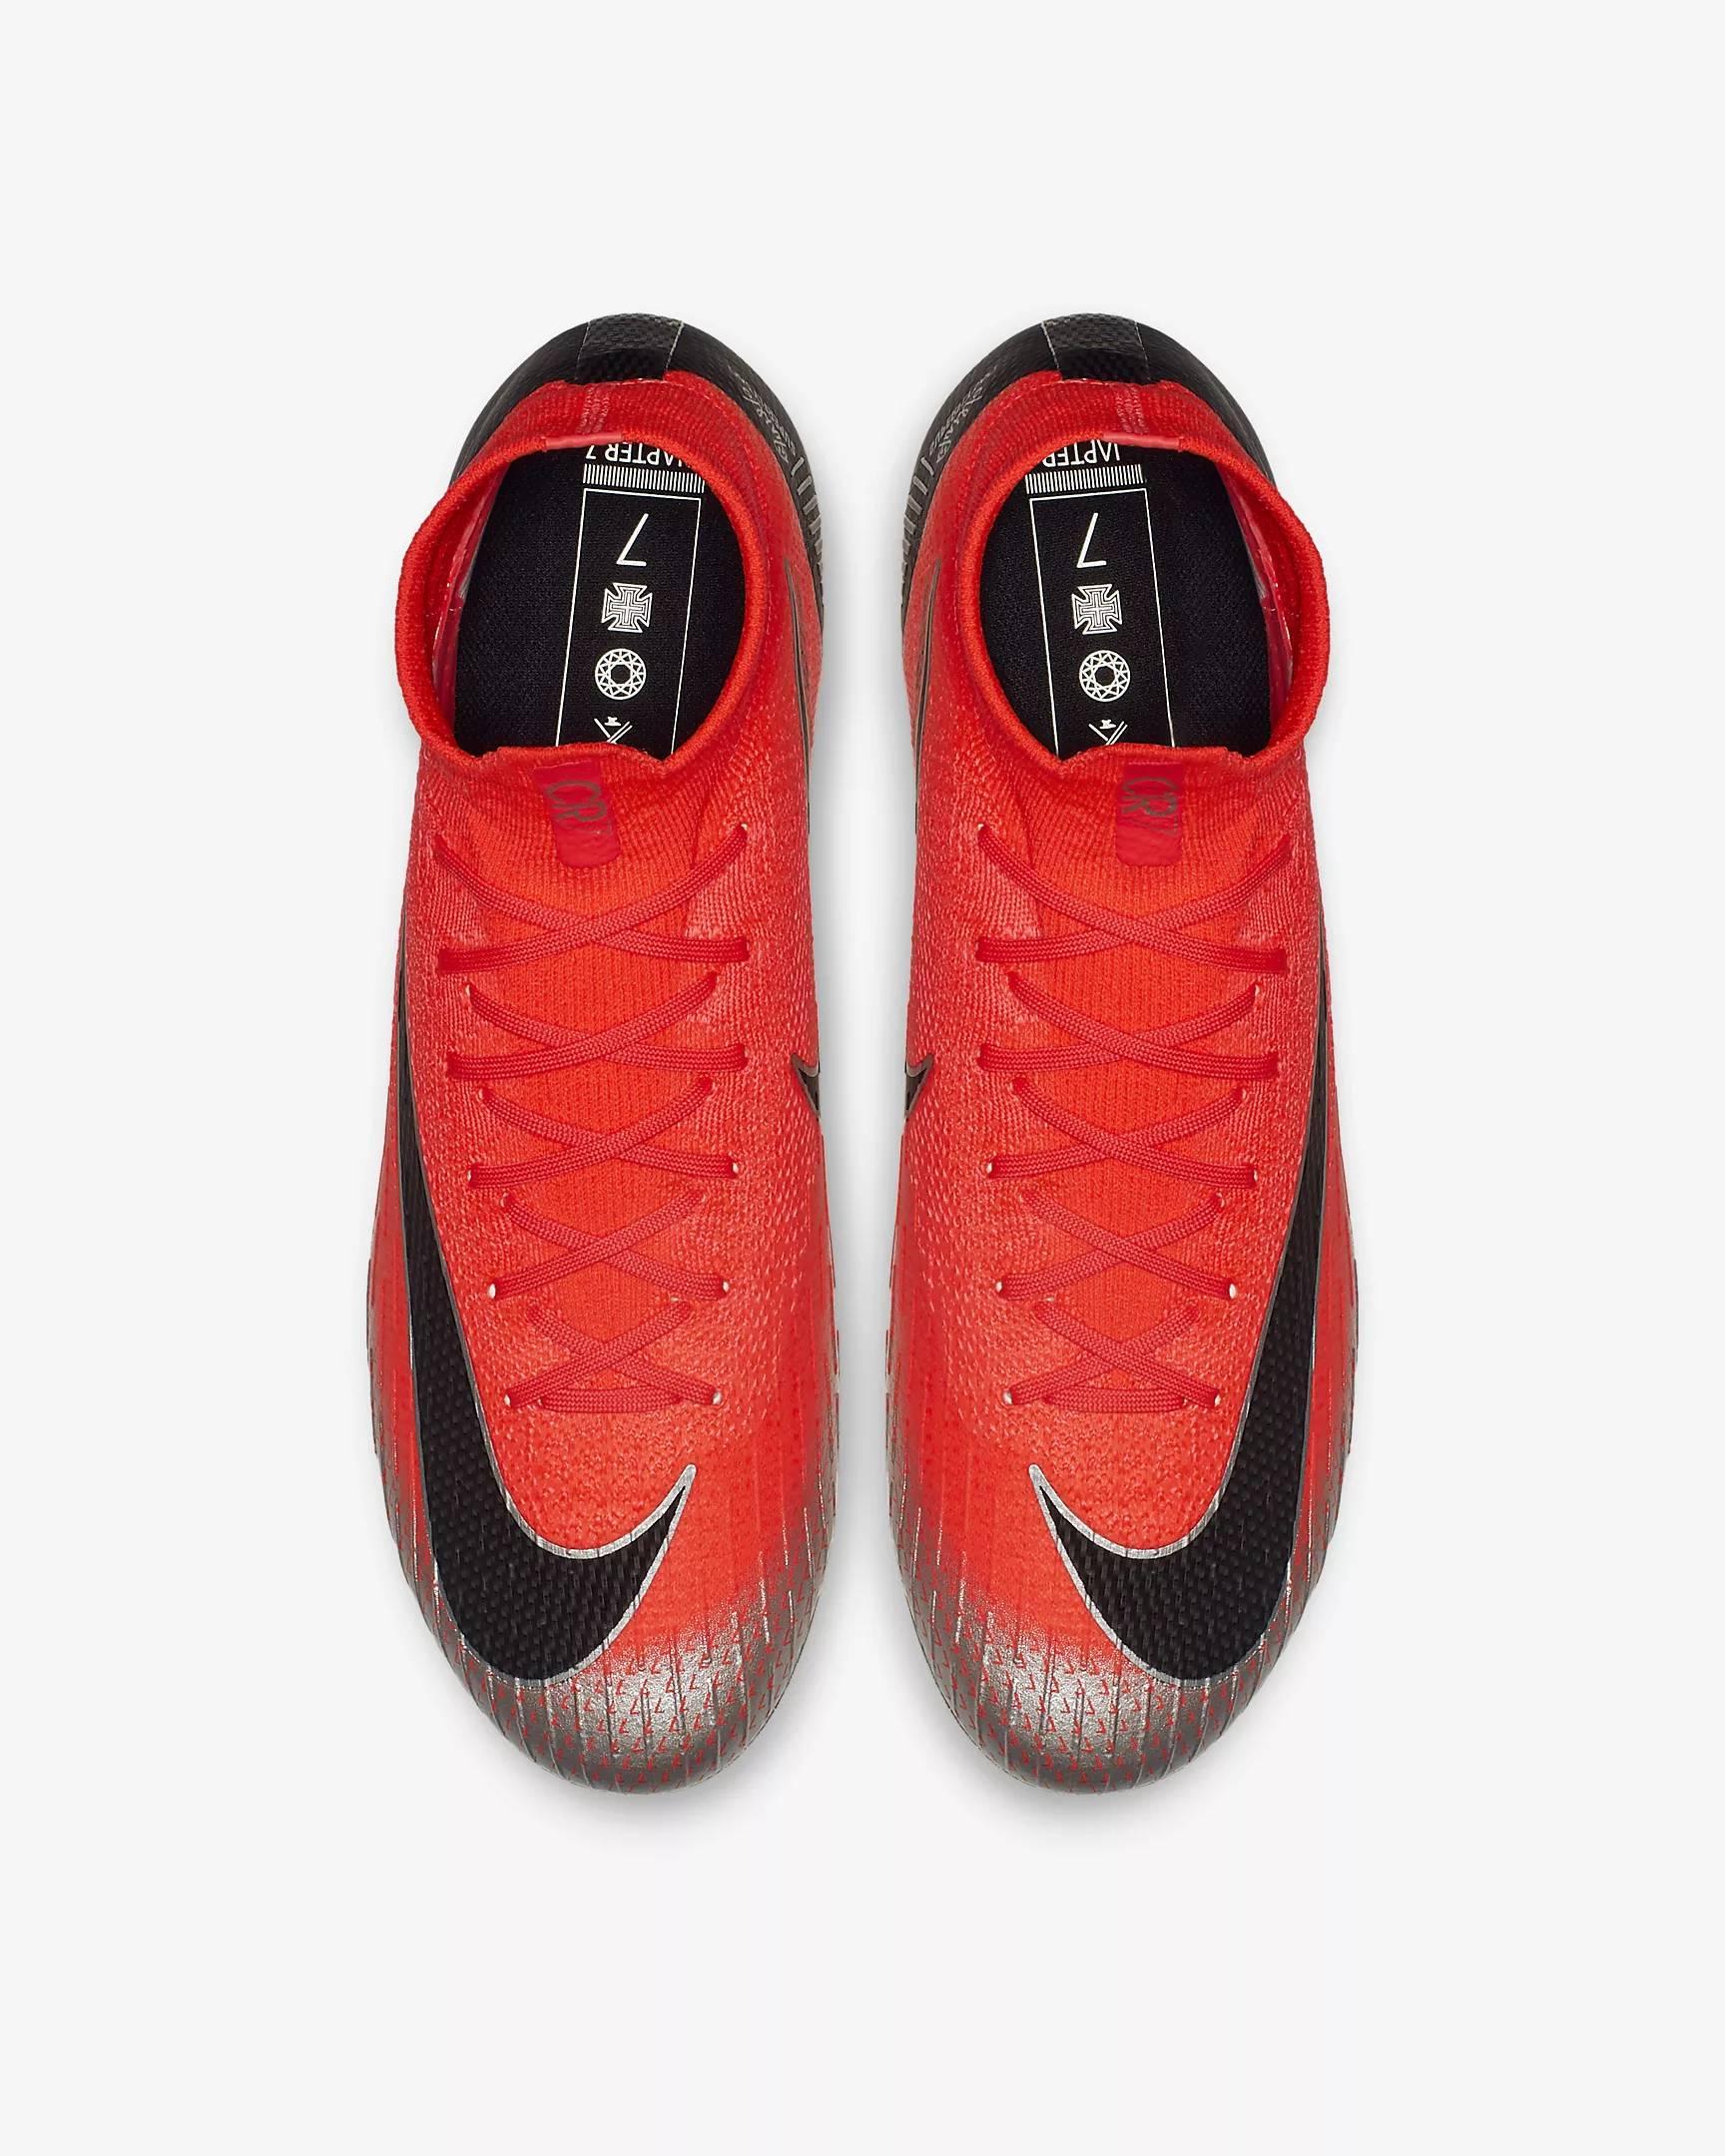 Nike Mercurial Superfly 360 Elite CR7 FG Chapter 7 - Flash Crimson   Total  Crimson   Black 06cdd4fe2